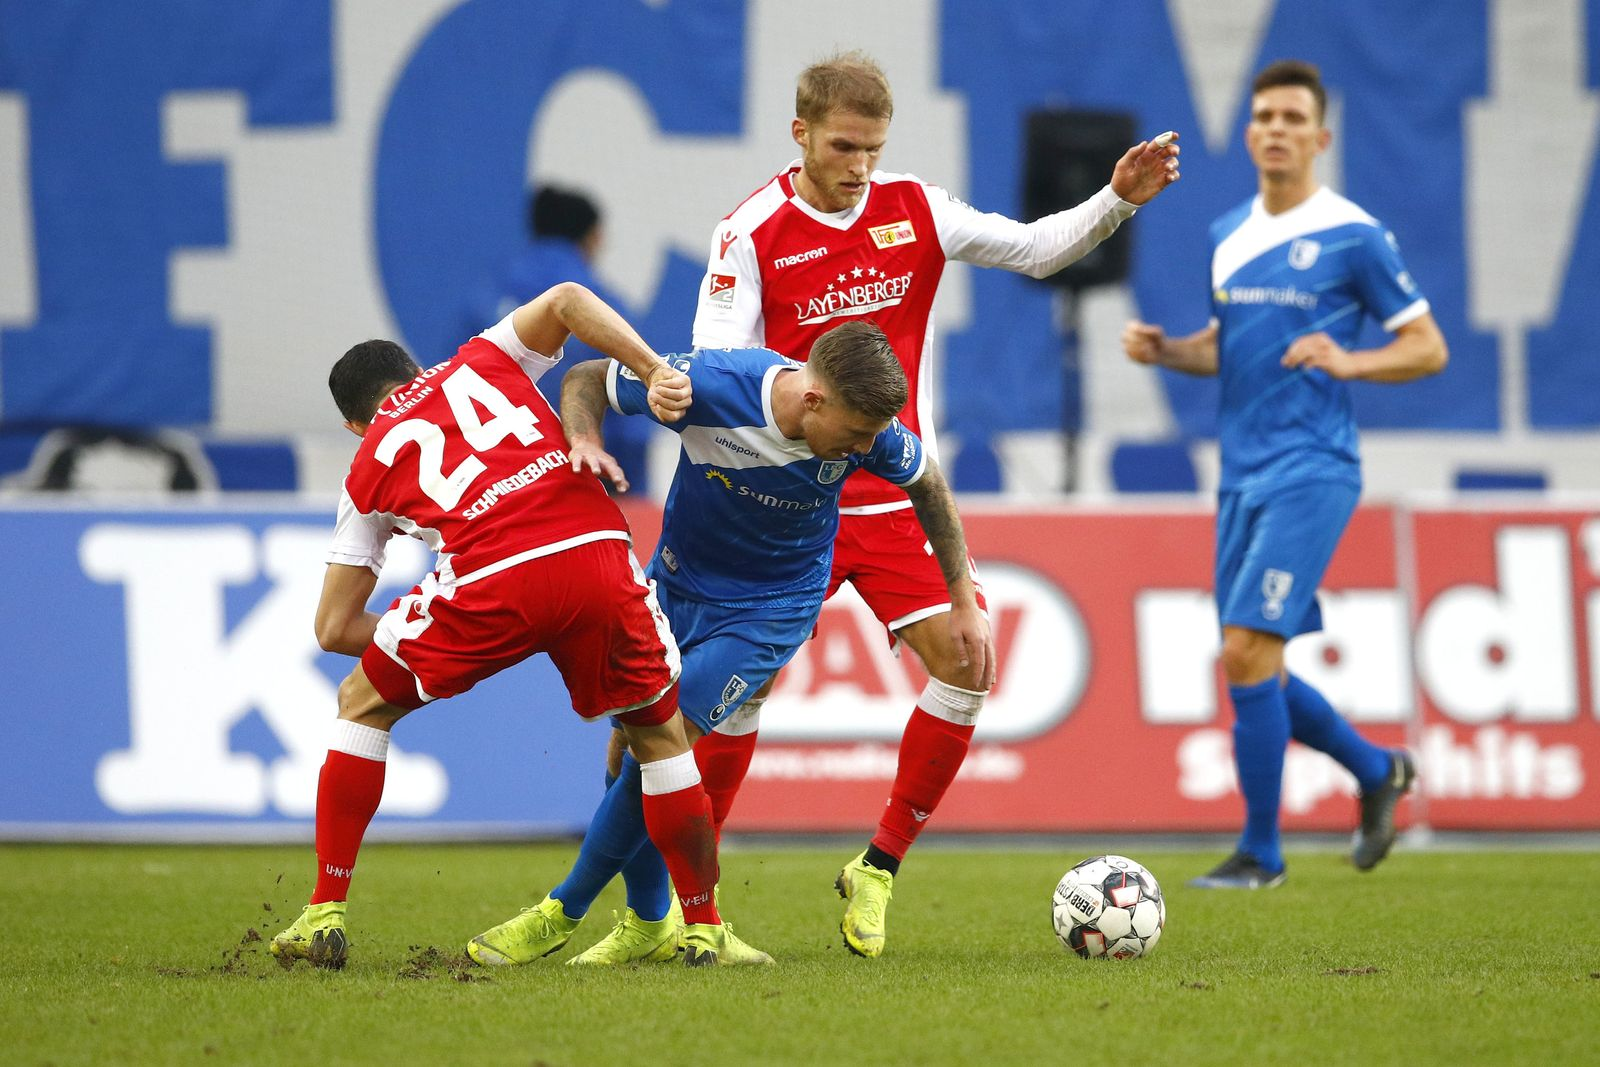 1. FC Magdeburg - 1. FC Union Berlin